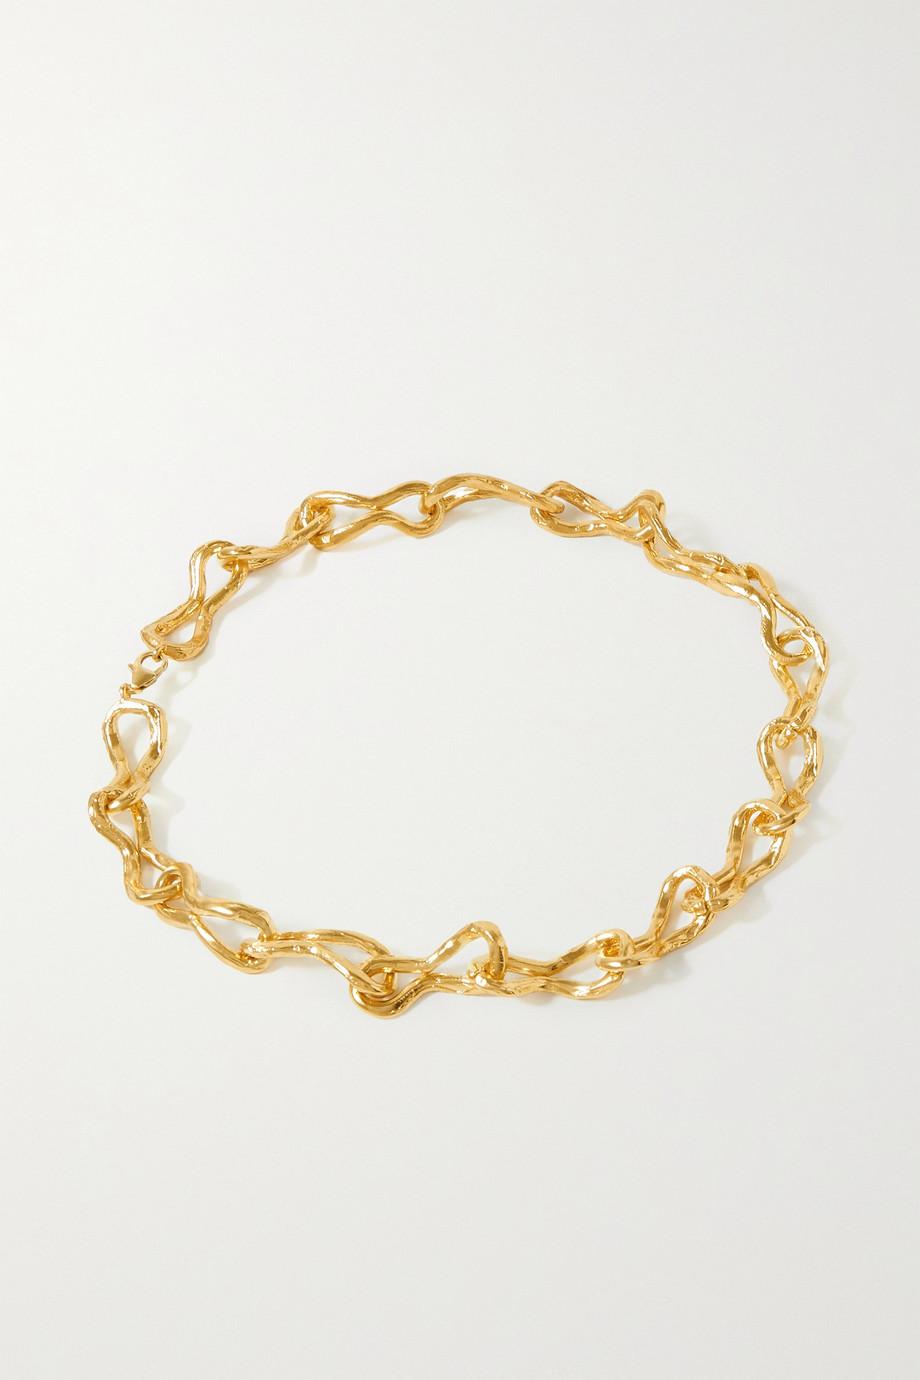 Alighieri The Unwinding Constellation gold-plated choker